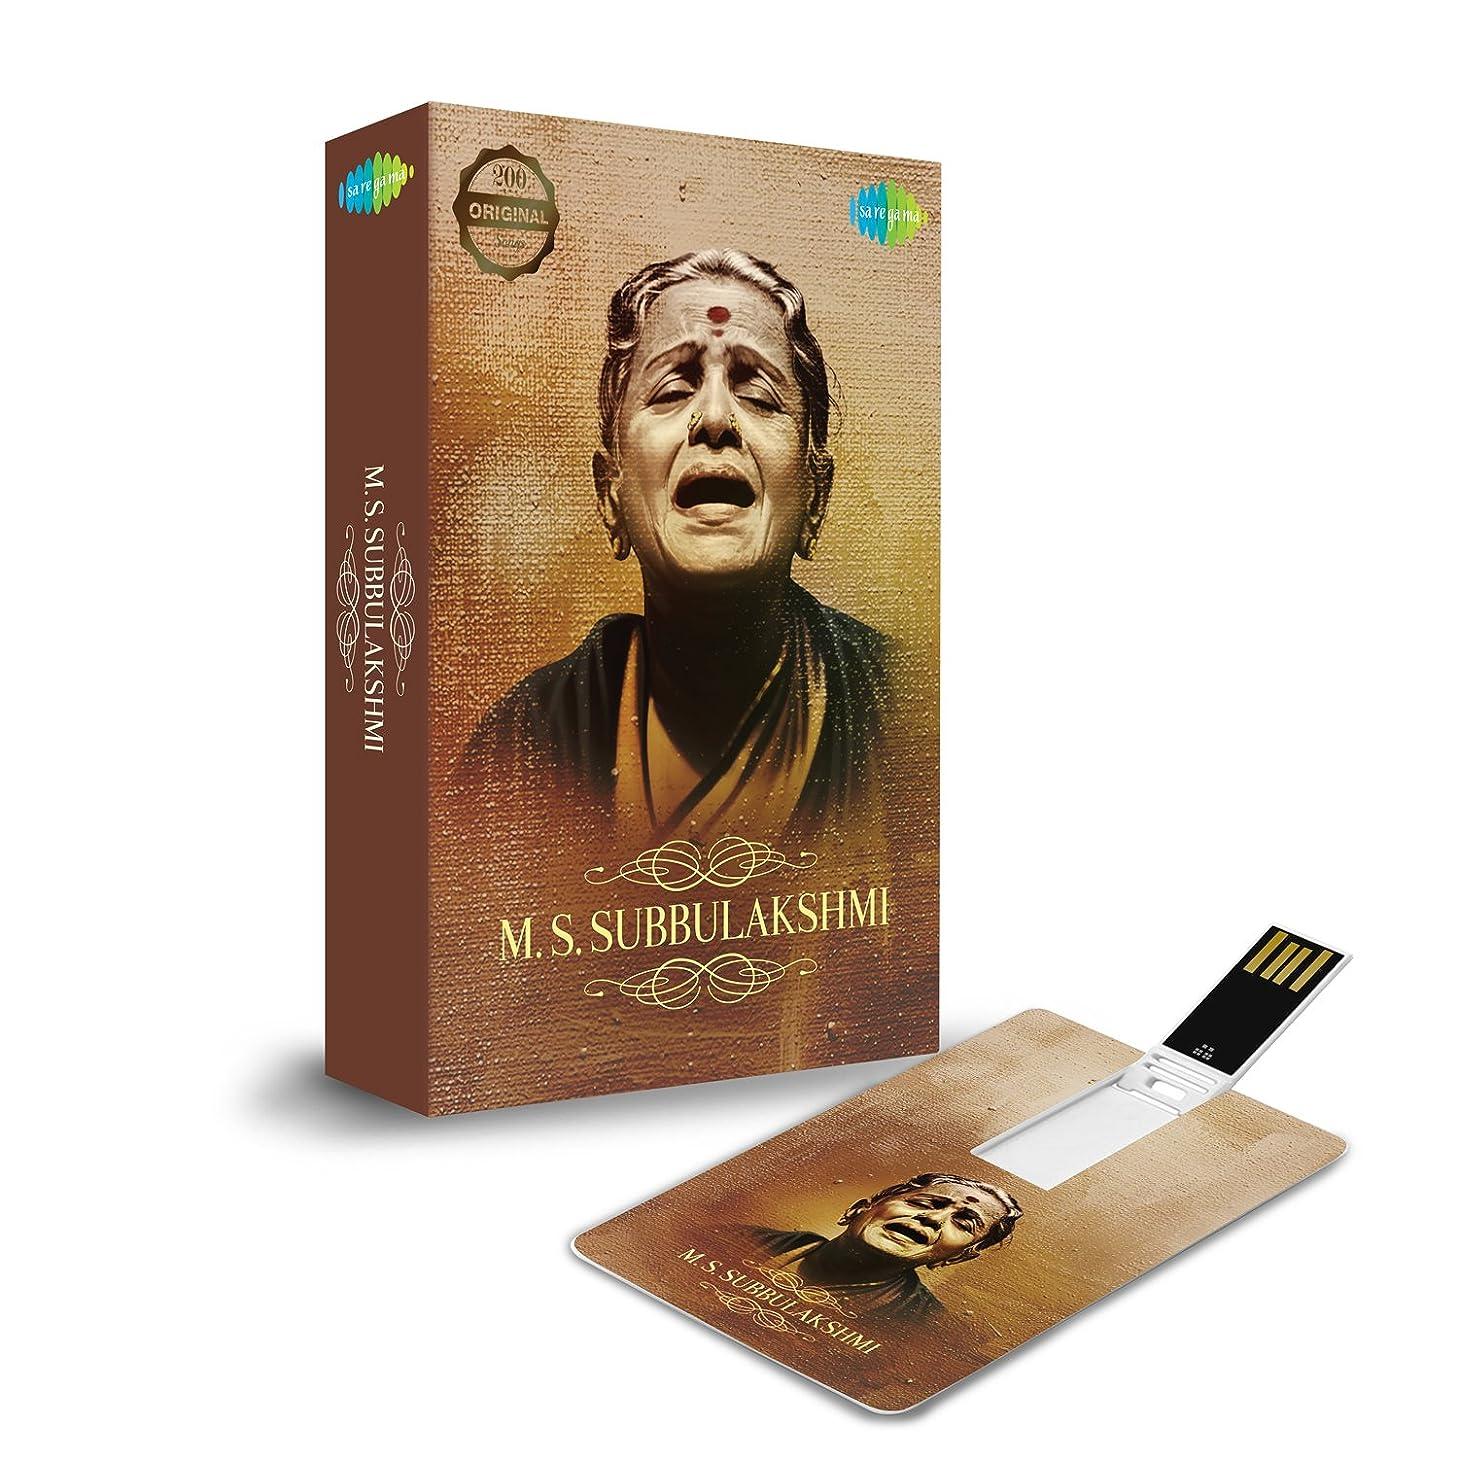 Music Card: M.S. Subbulakshmi 320 Kbps Mp3 Audio